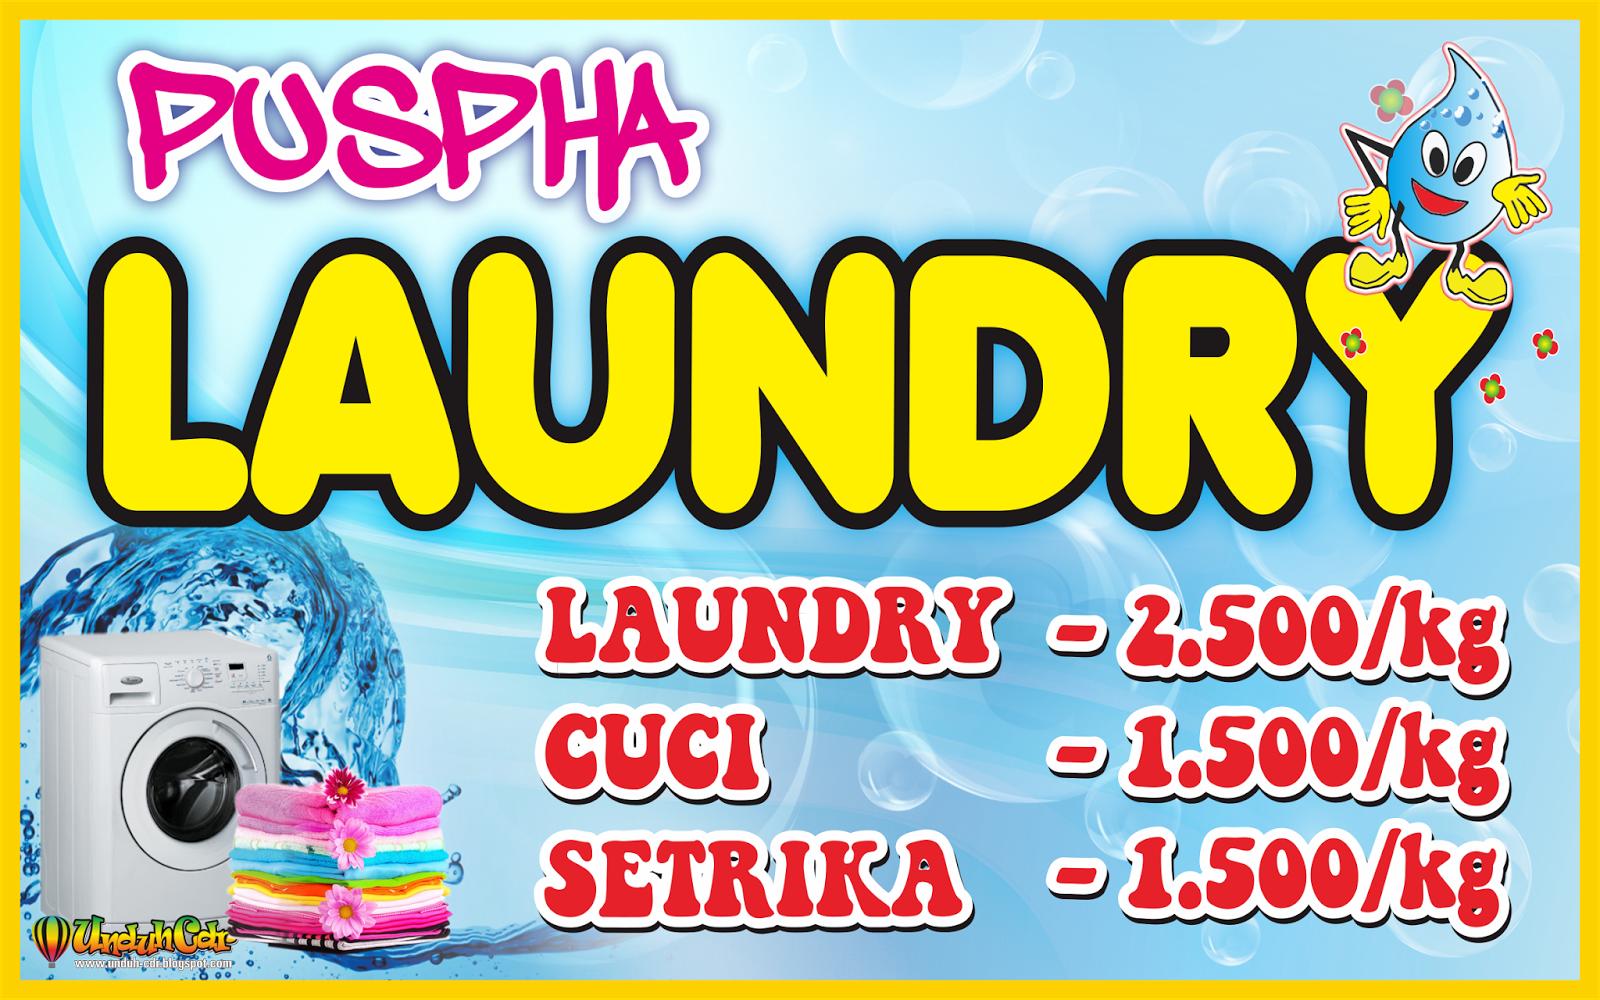 Desain Spanduk/Banner Laundry File Cdr   Omah Corel